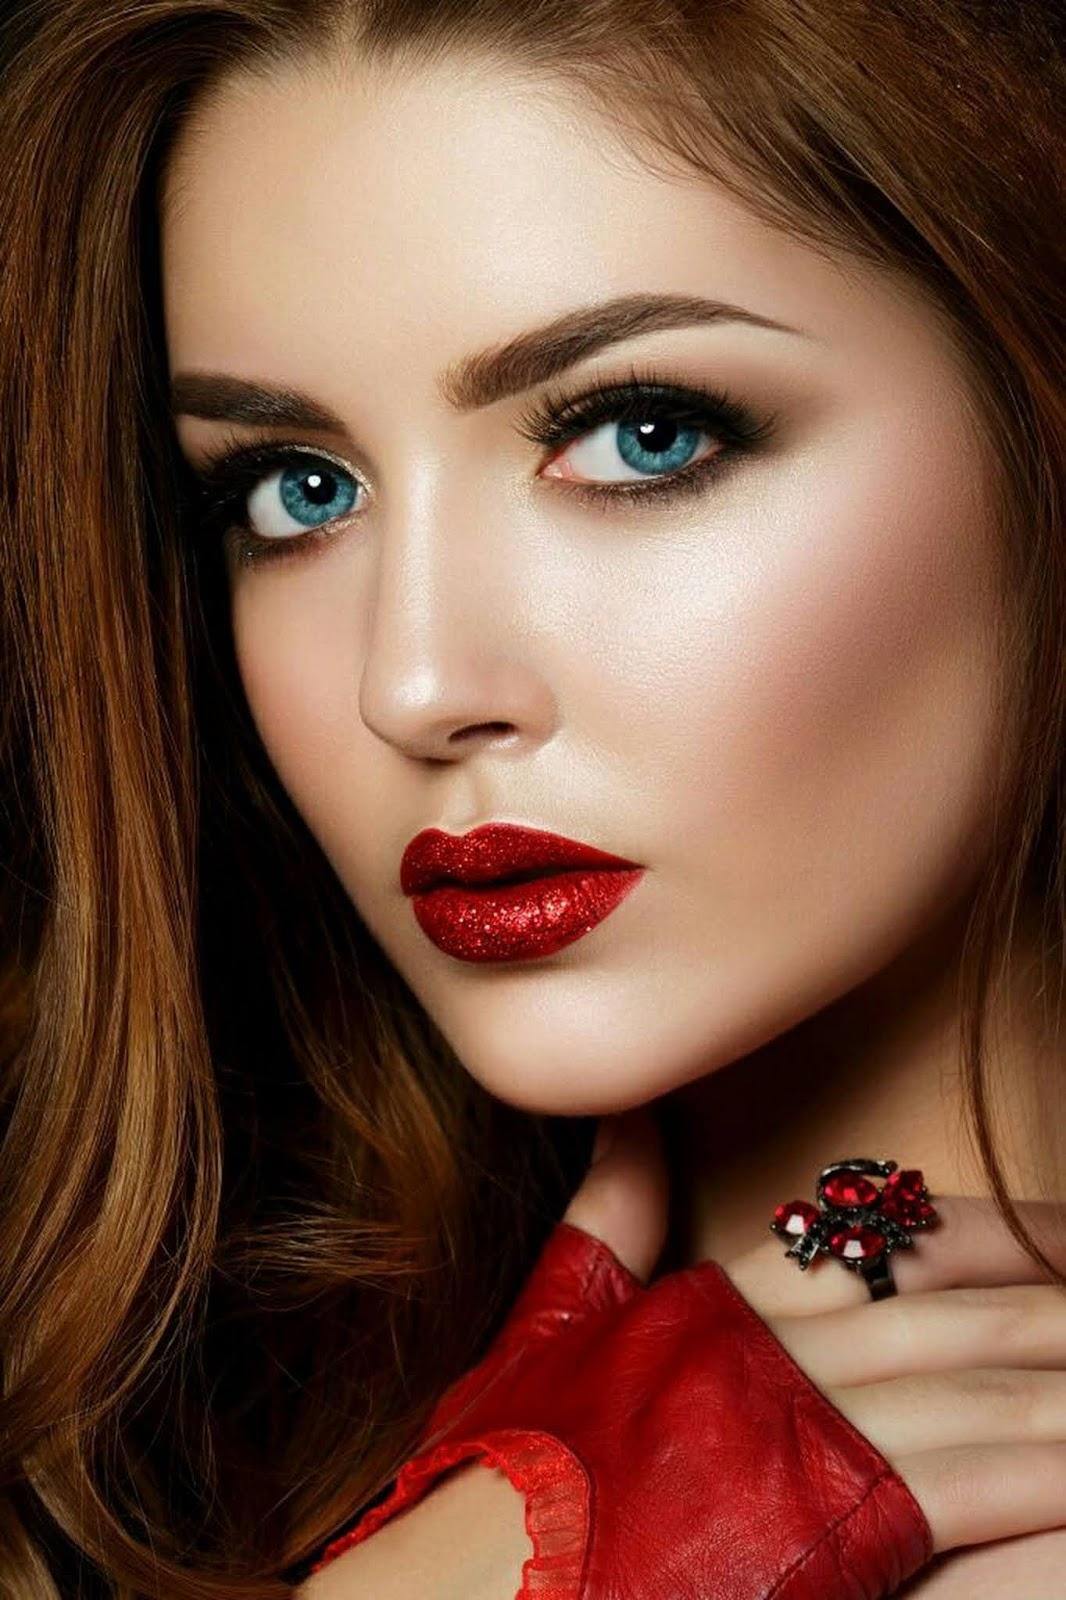 Beautiful Girl Eyes DP 2020